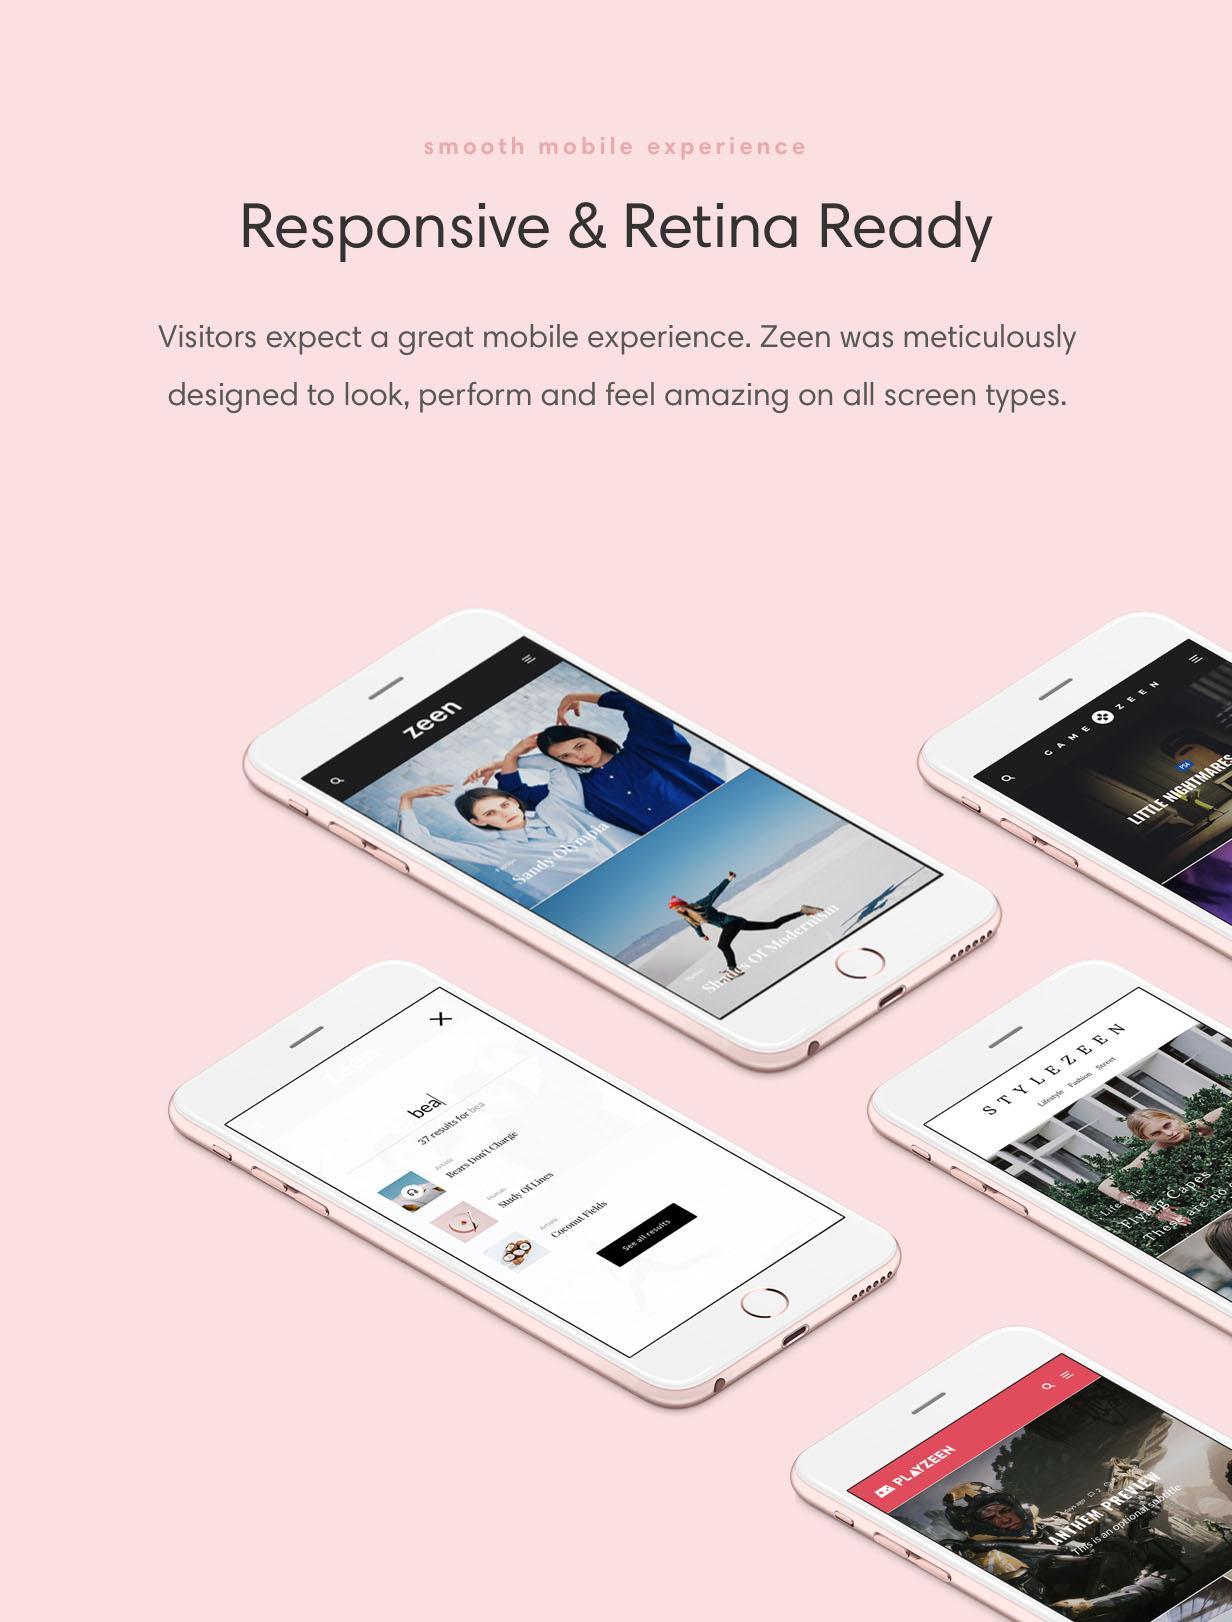 Zeen is a responsive WordPress theme